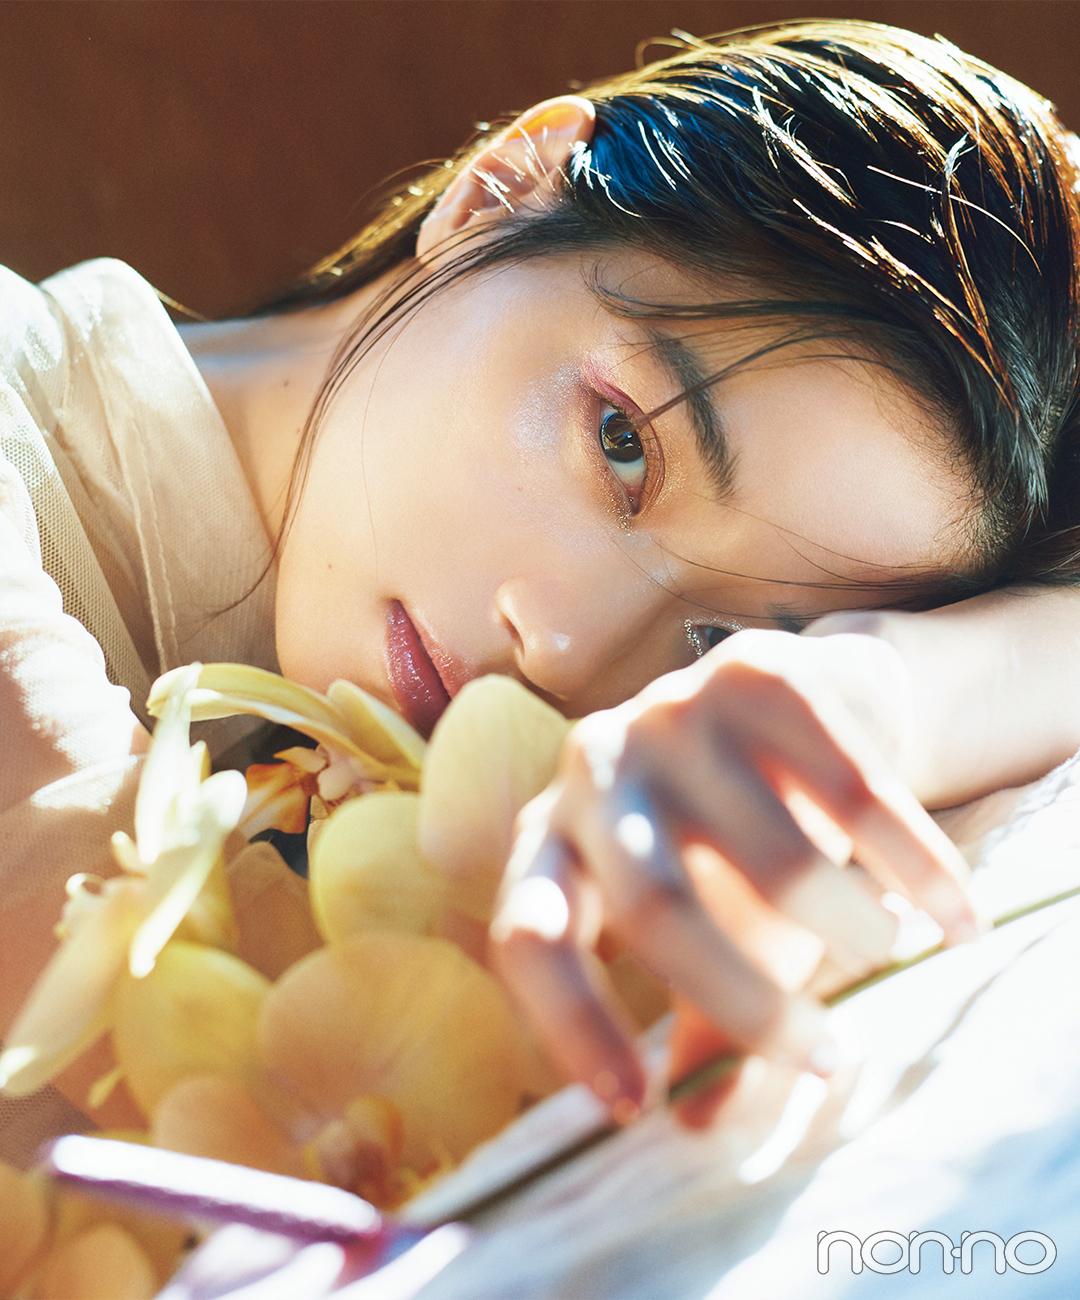 Photo Gallery|モデル・西野七瀬の最新フォトギャラリーを見る_1_6